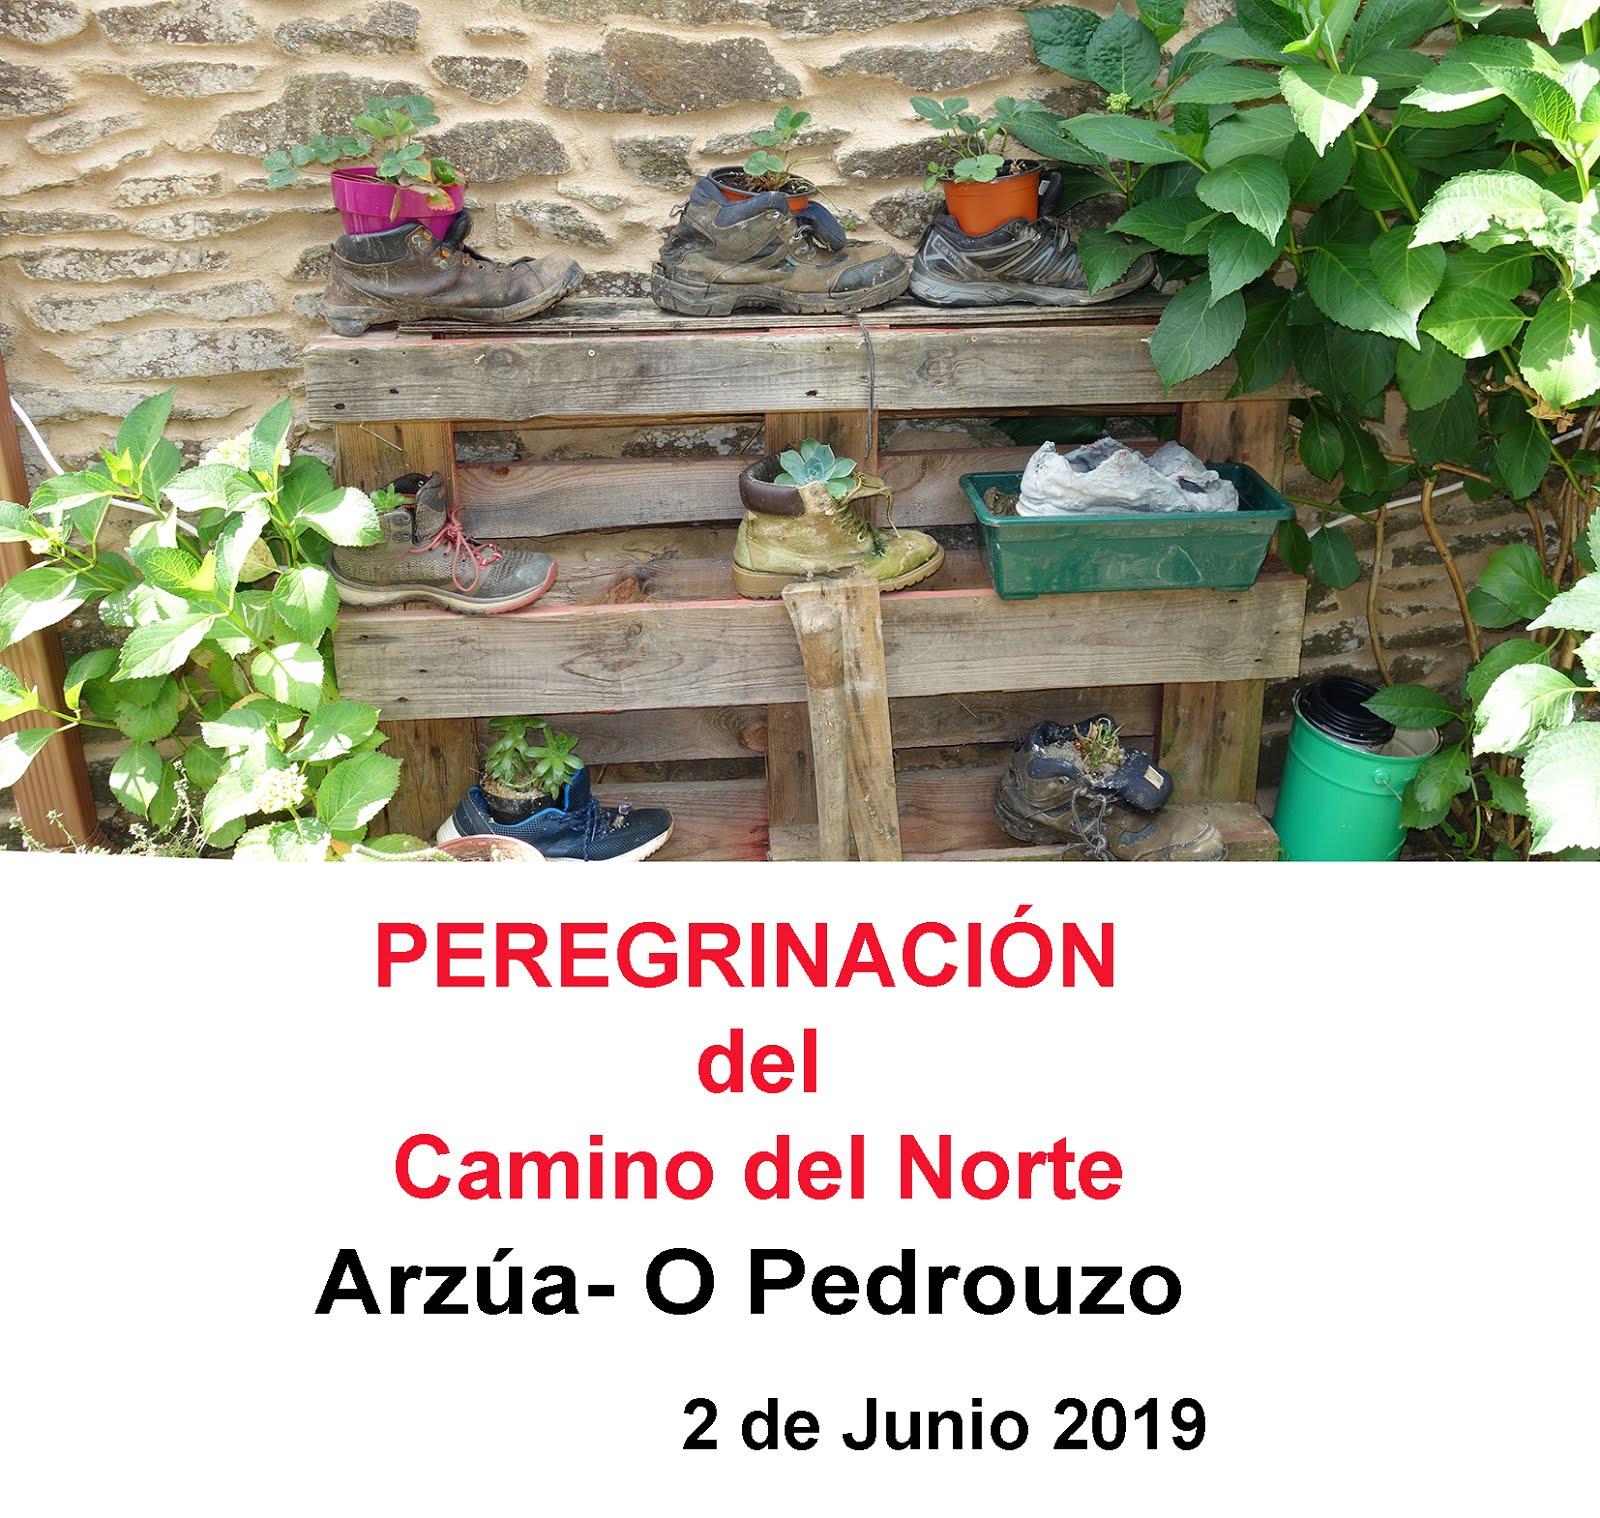 Arzua-O Pedrouzo